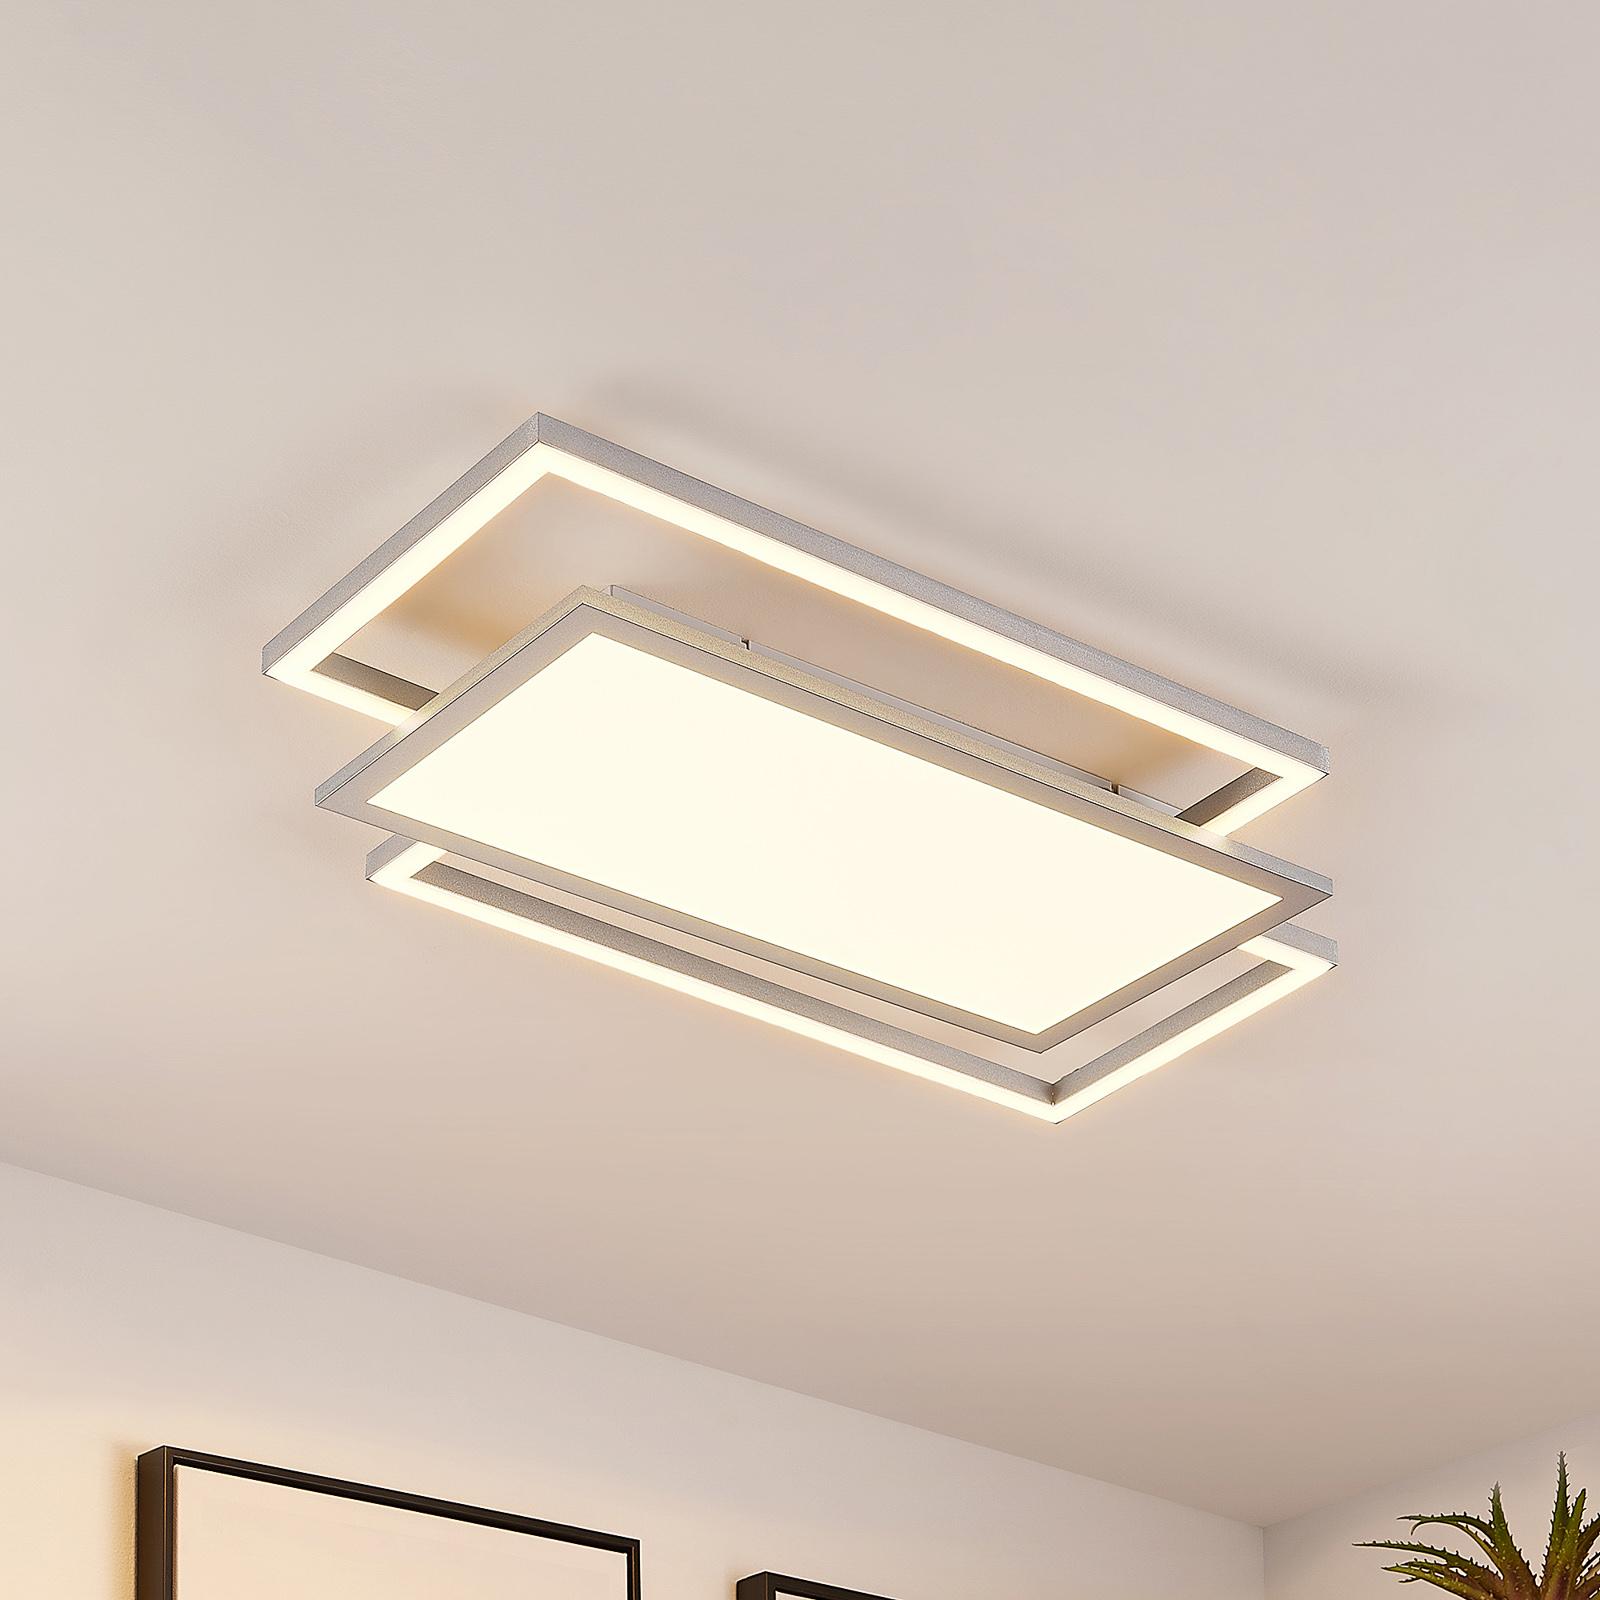 Lucande Ciaran lampa sufitowa LED, prostokąty